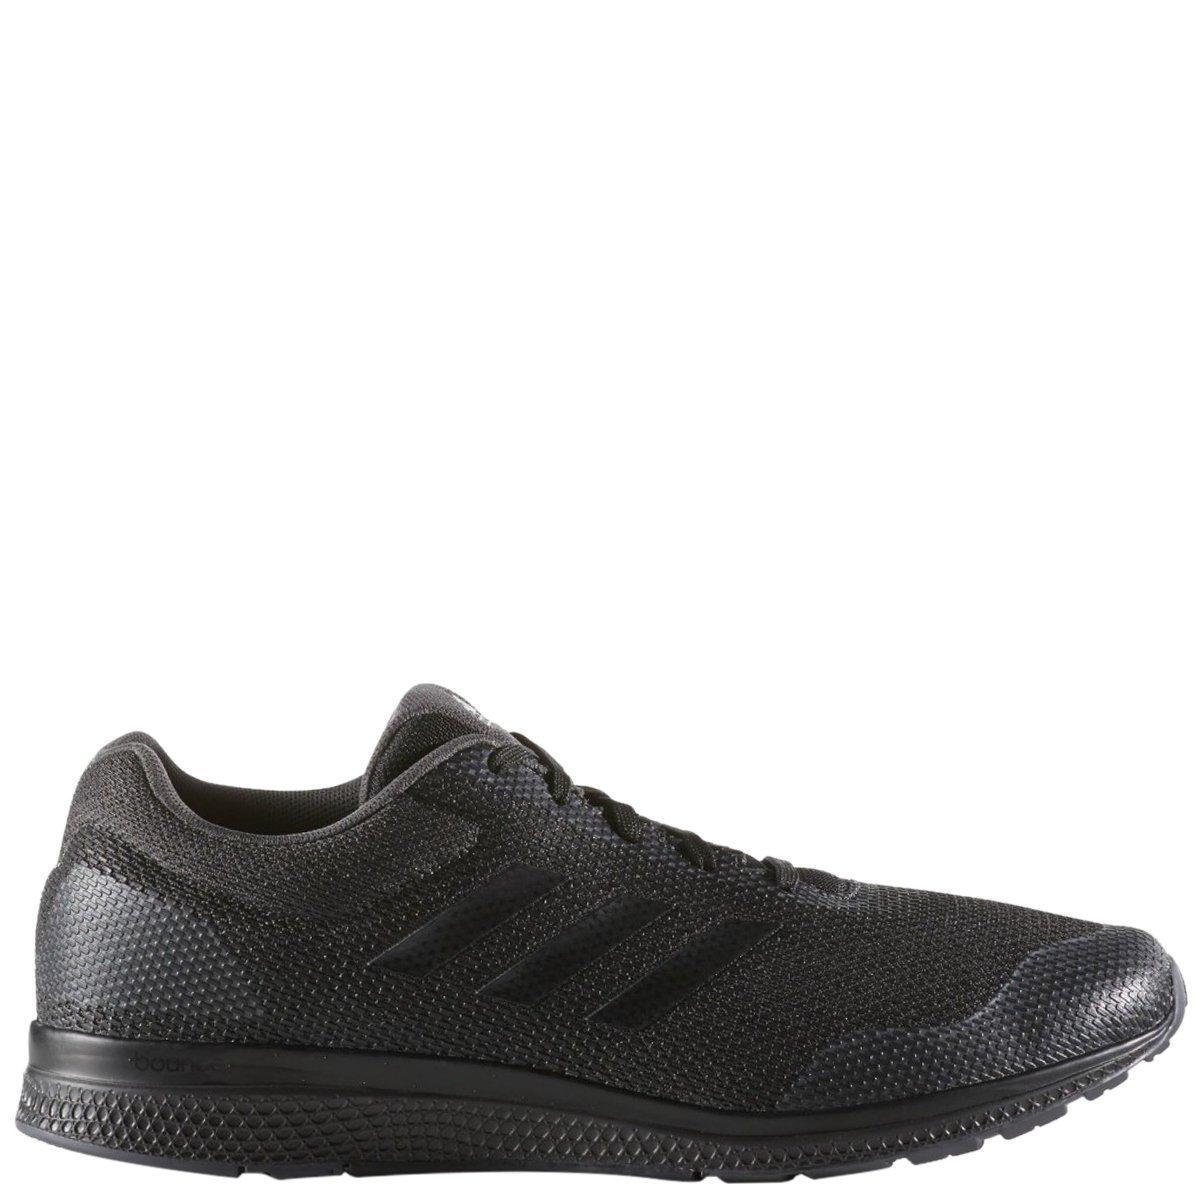 73d080cf9f6 Bizz Store - Tênis Masculino Adidas Mana Bounce 2 M Aramis Preto